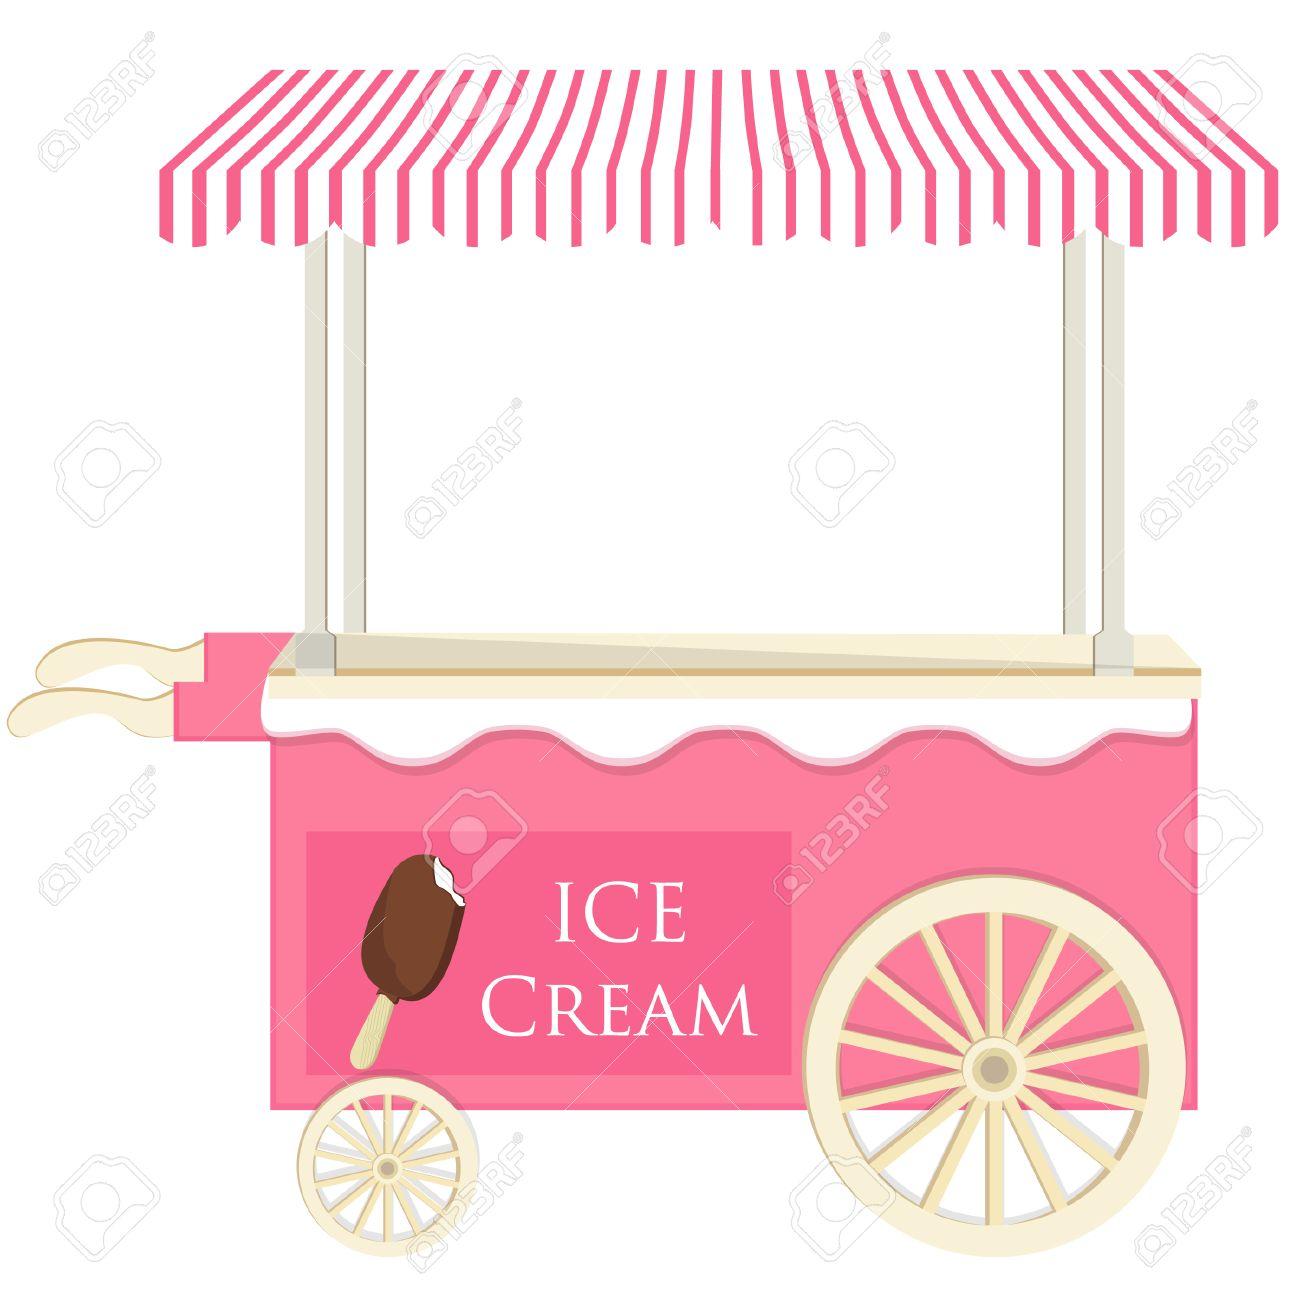 Ice cream pink cart vector icon isolated, ice cream stand, ice...